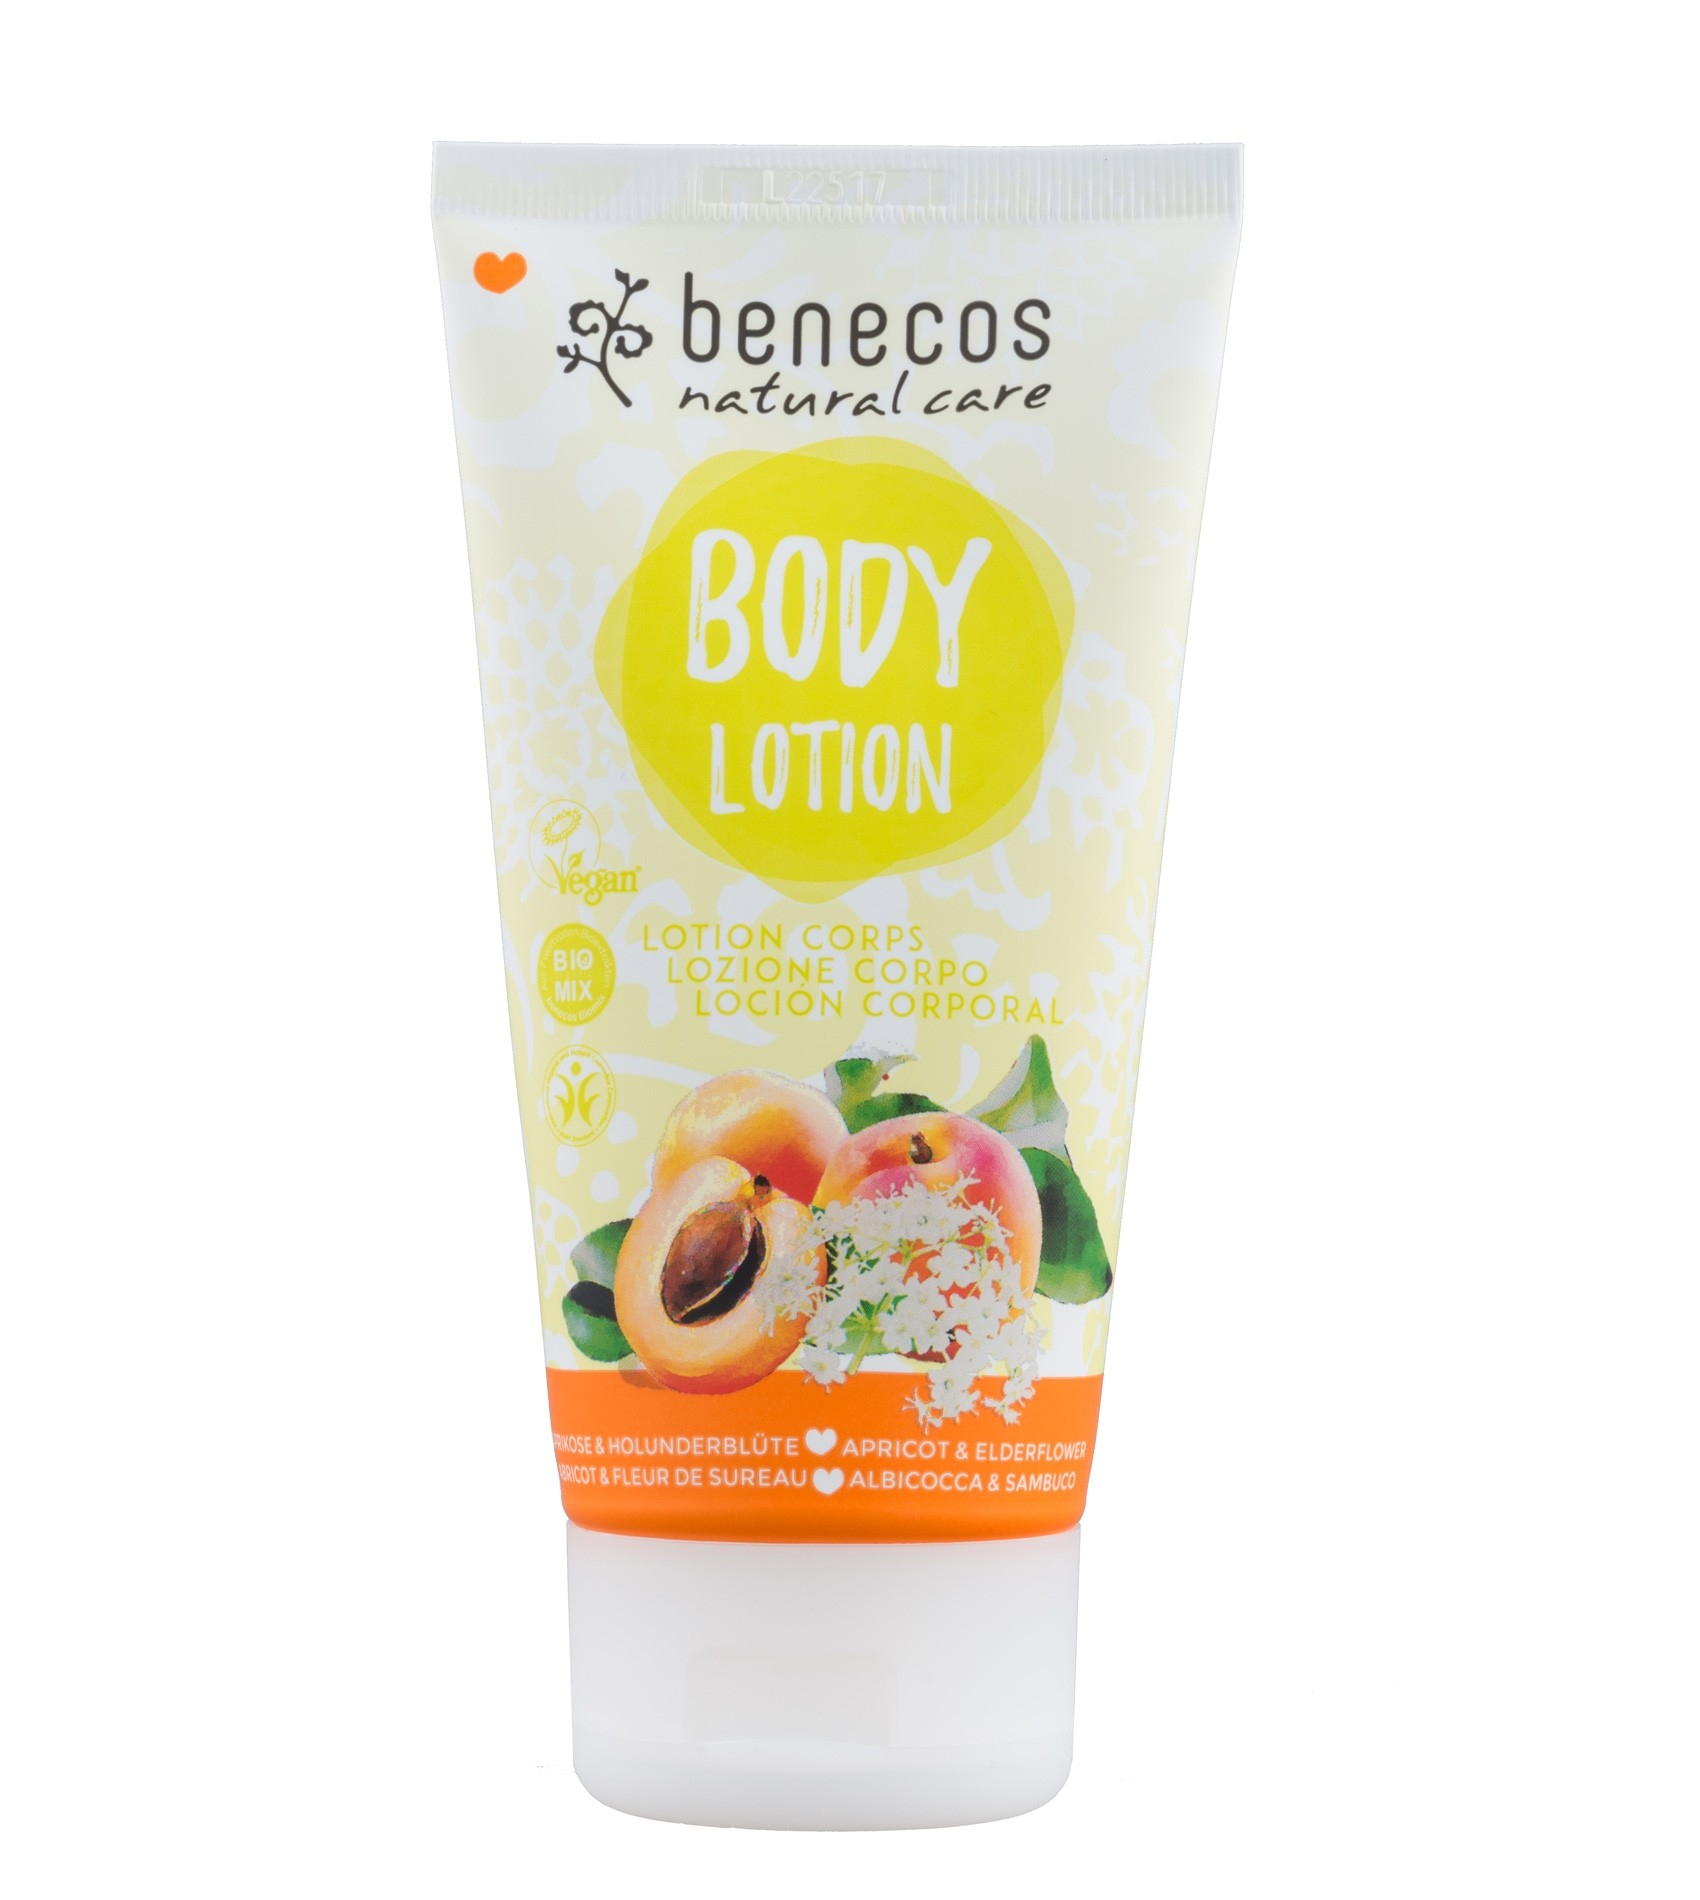 Benecos Vegan Apricot & Elderflower Body Lotion